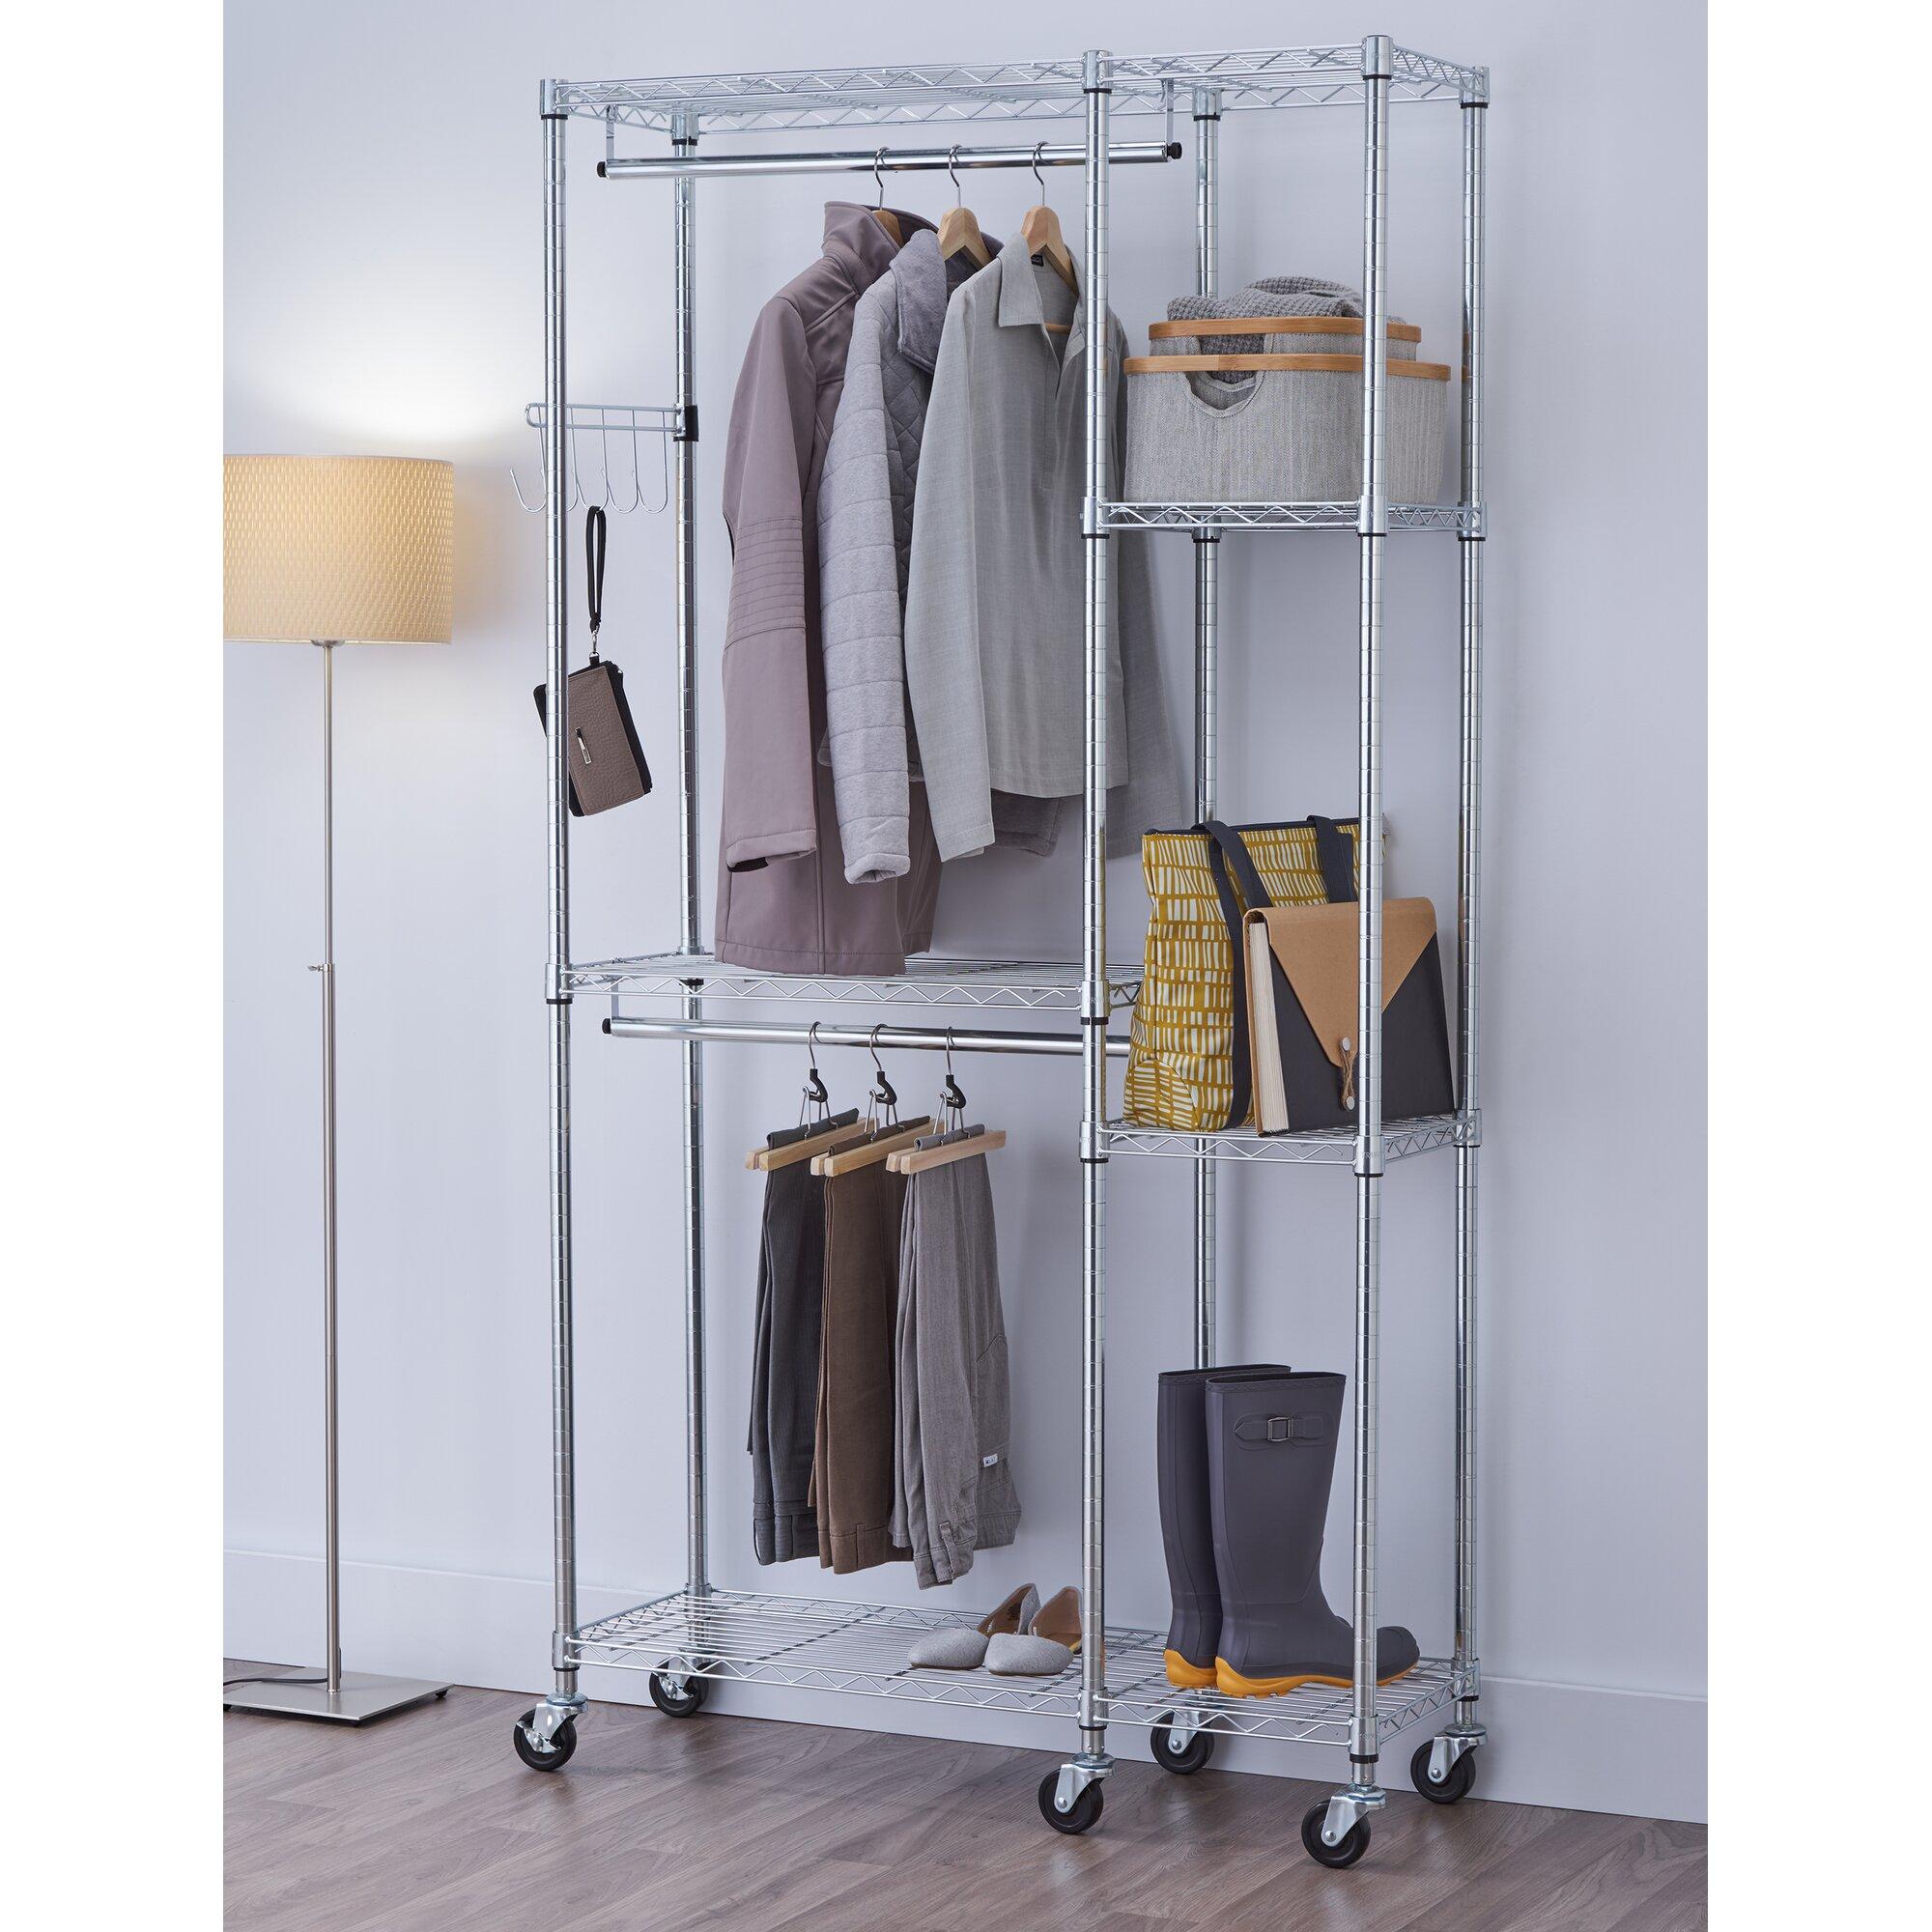 Portable wardrobe on wheels - Mobile 41 Garment Rack